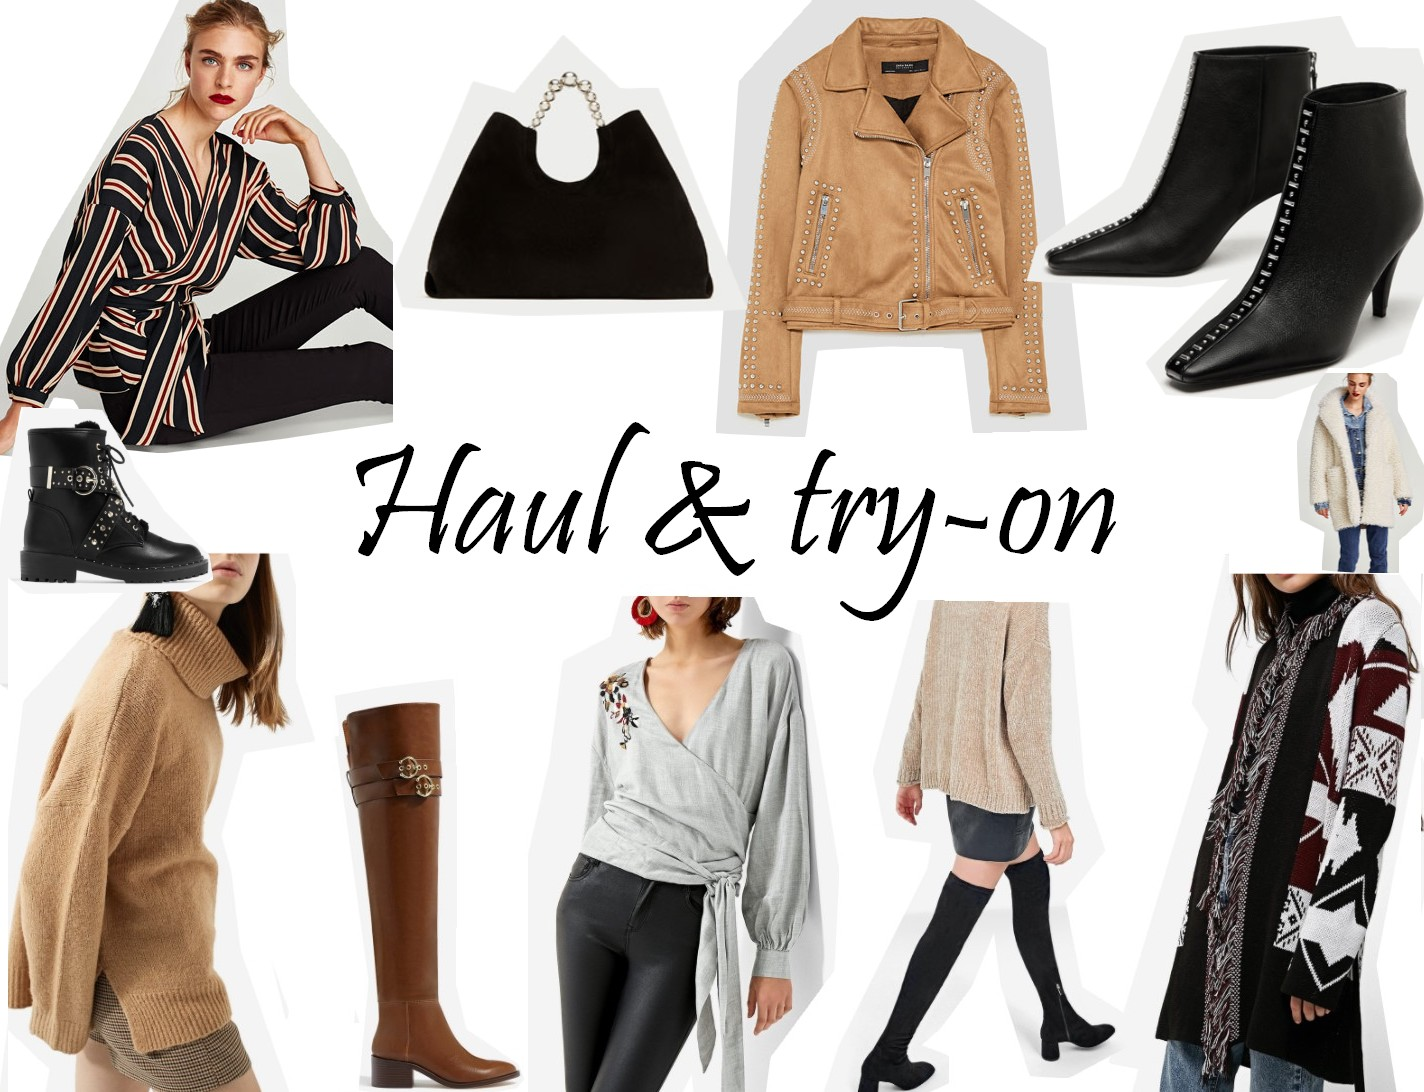 fashion-haul-mode-zara-stradivarius-asos-boohoo